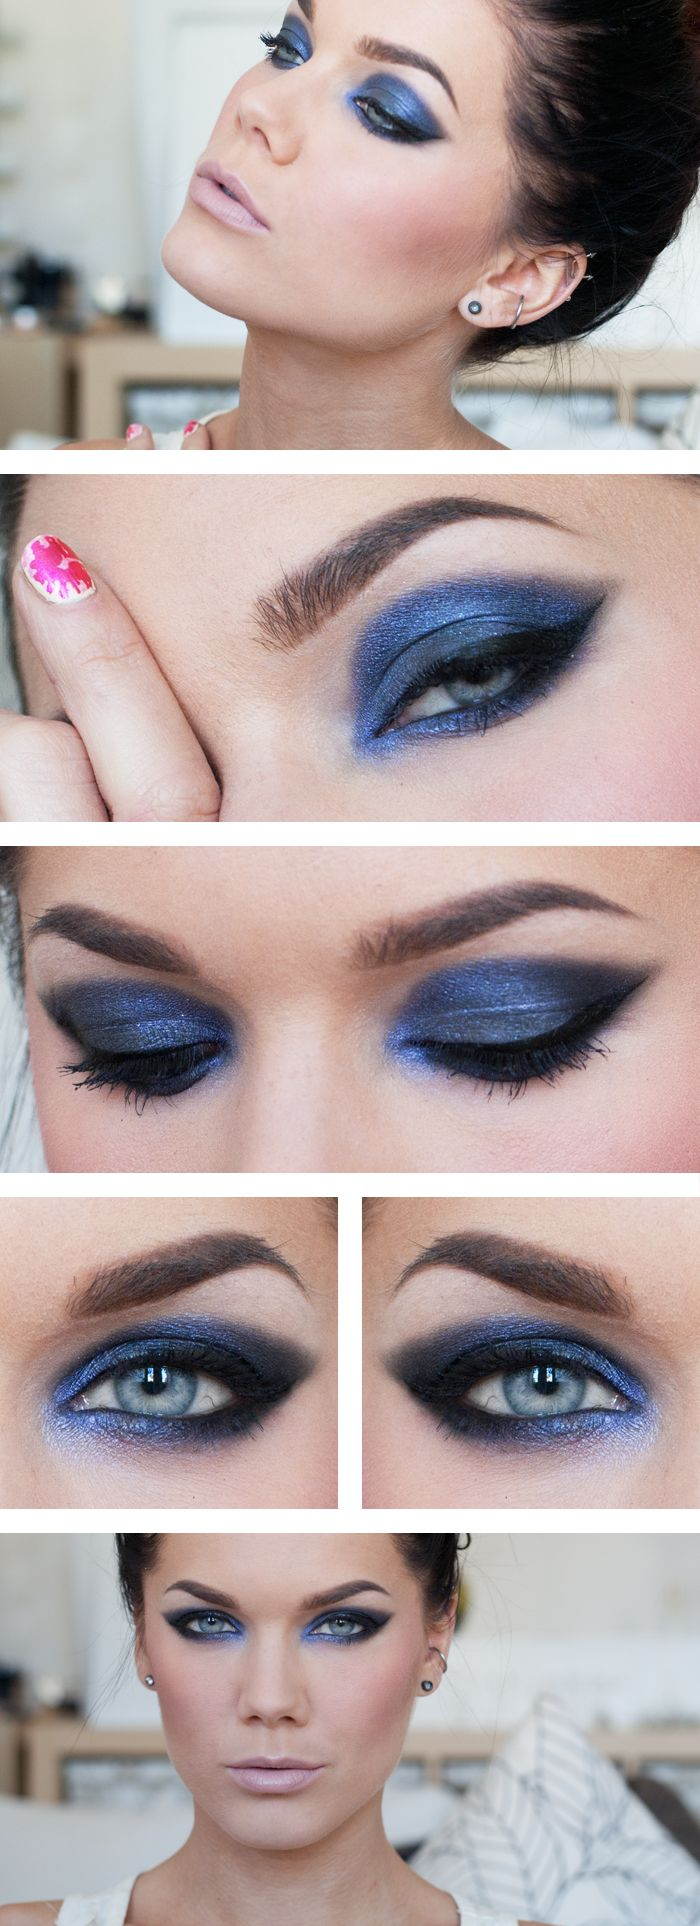 Makeup Geek Eyeshadows Corrupt & Nautica